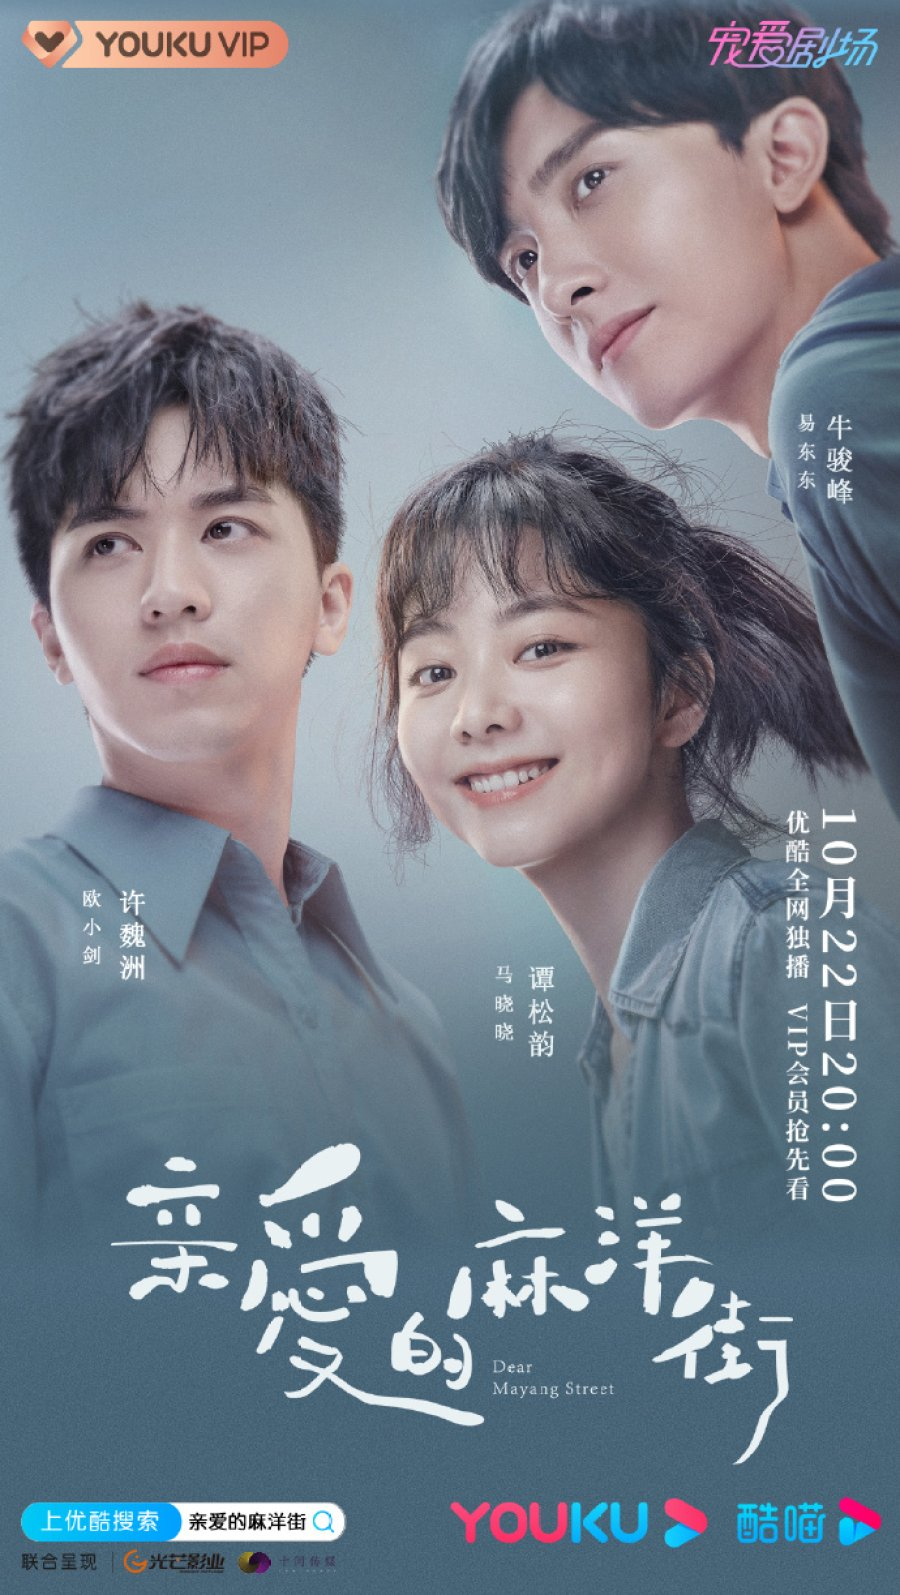 image poster from imdb - Dear Mayang Street (2020)